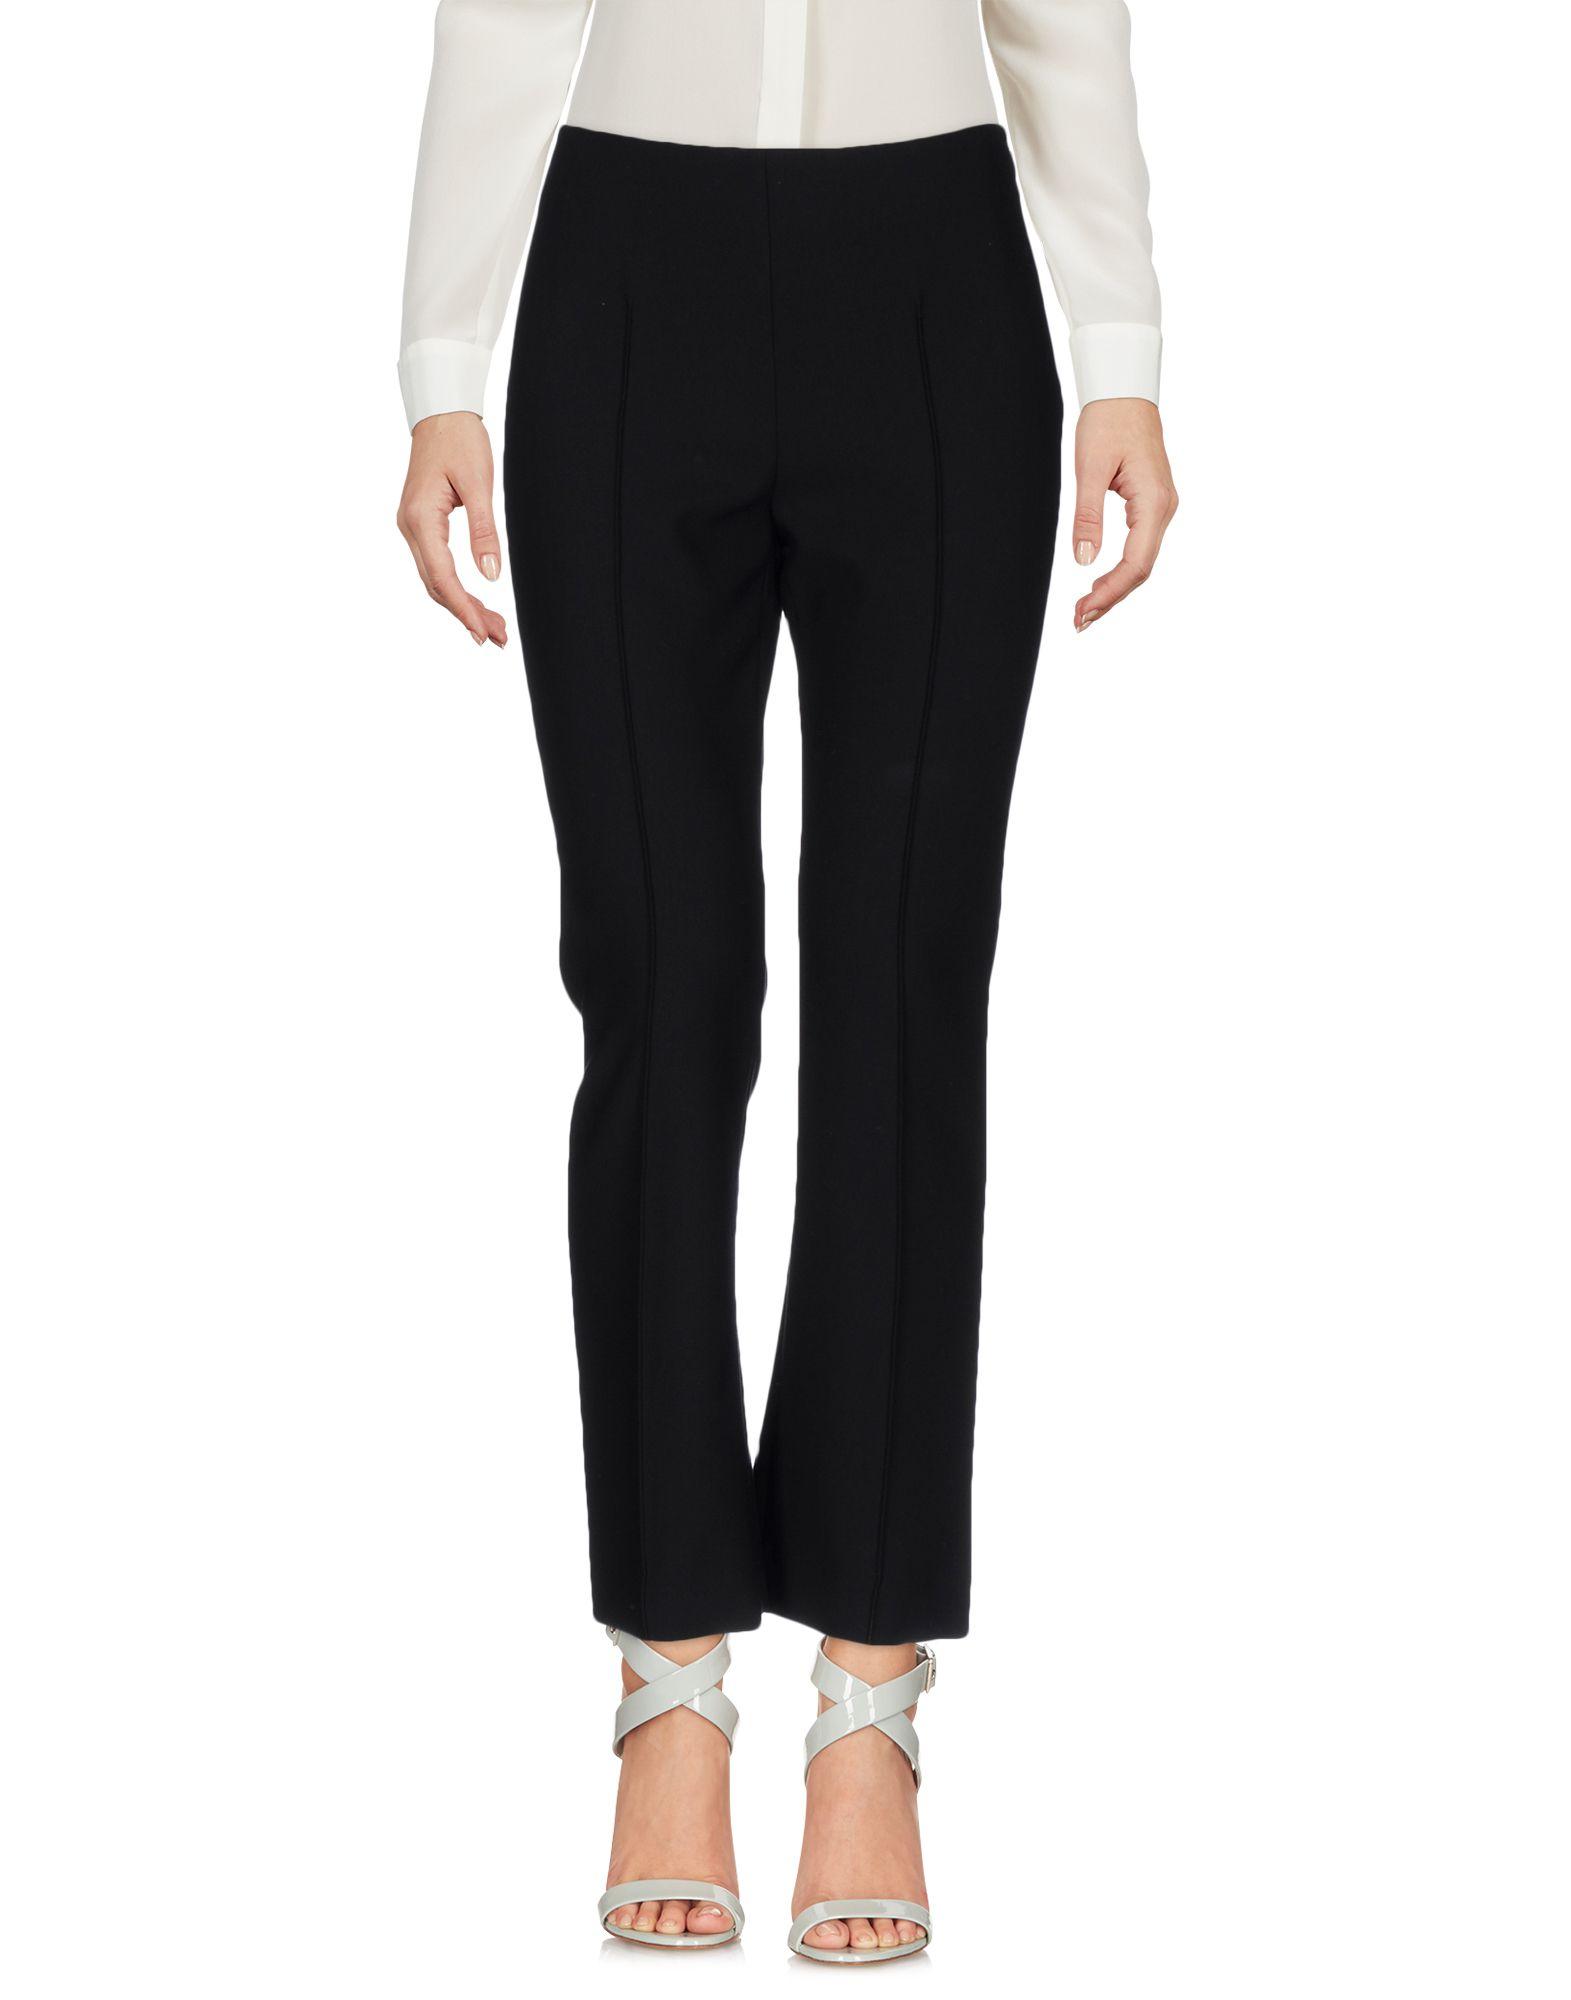 Pantalone Elizabeth And James Donna - Acquista online su JL9DwM